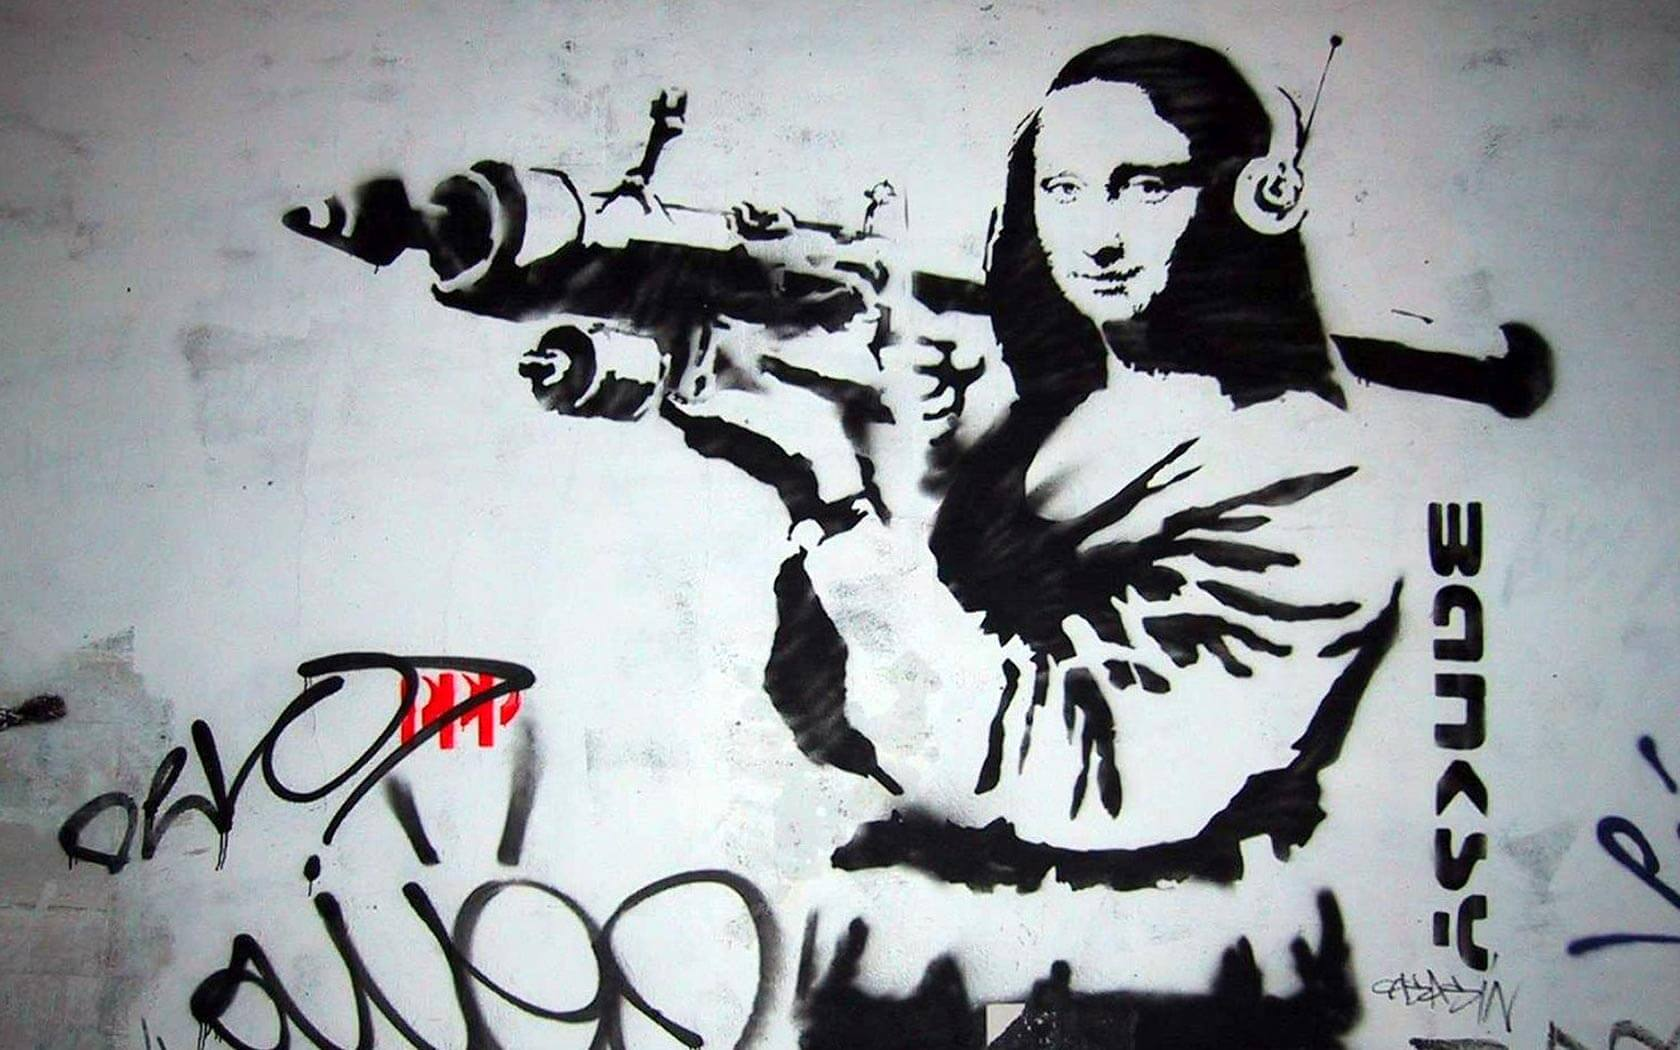 tableau-street-art-banksy-pas-cher12.jpg